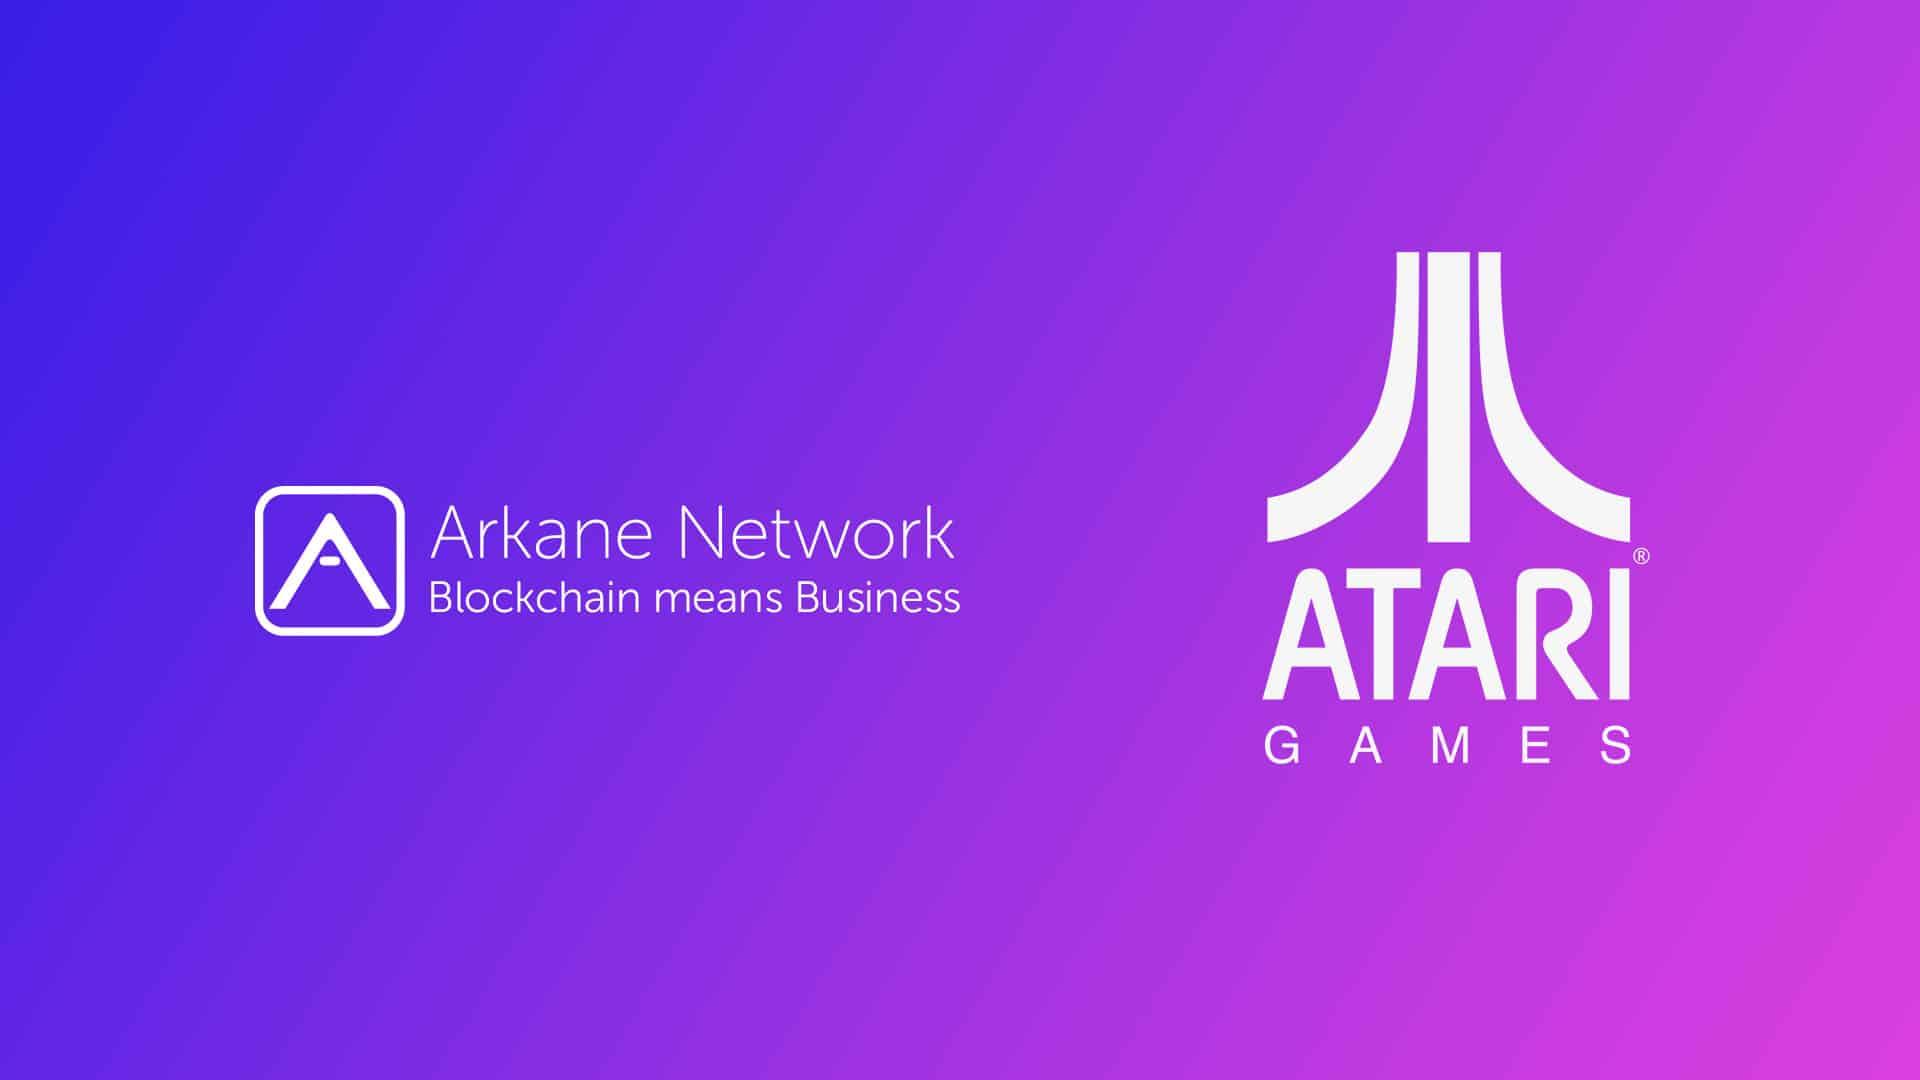 Atari and Arkane Network Partnership